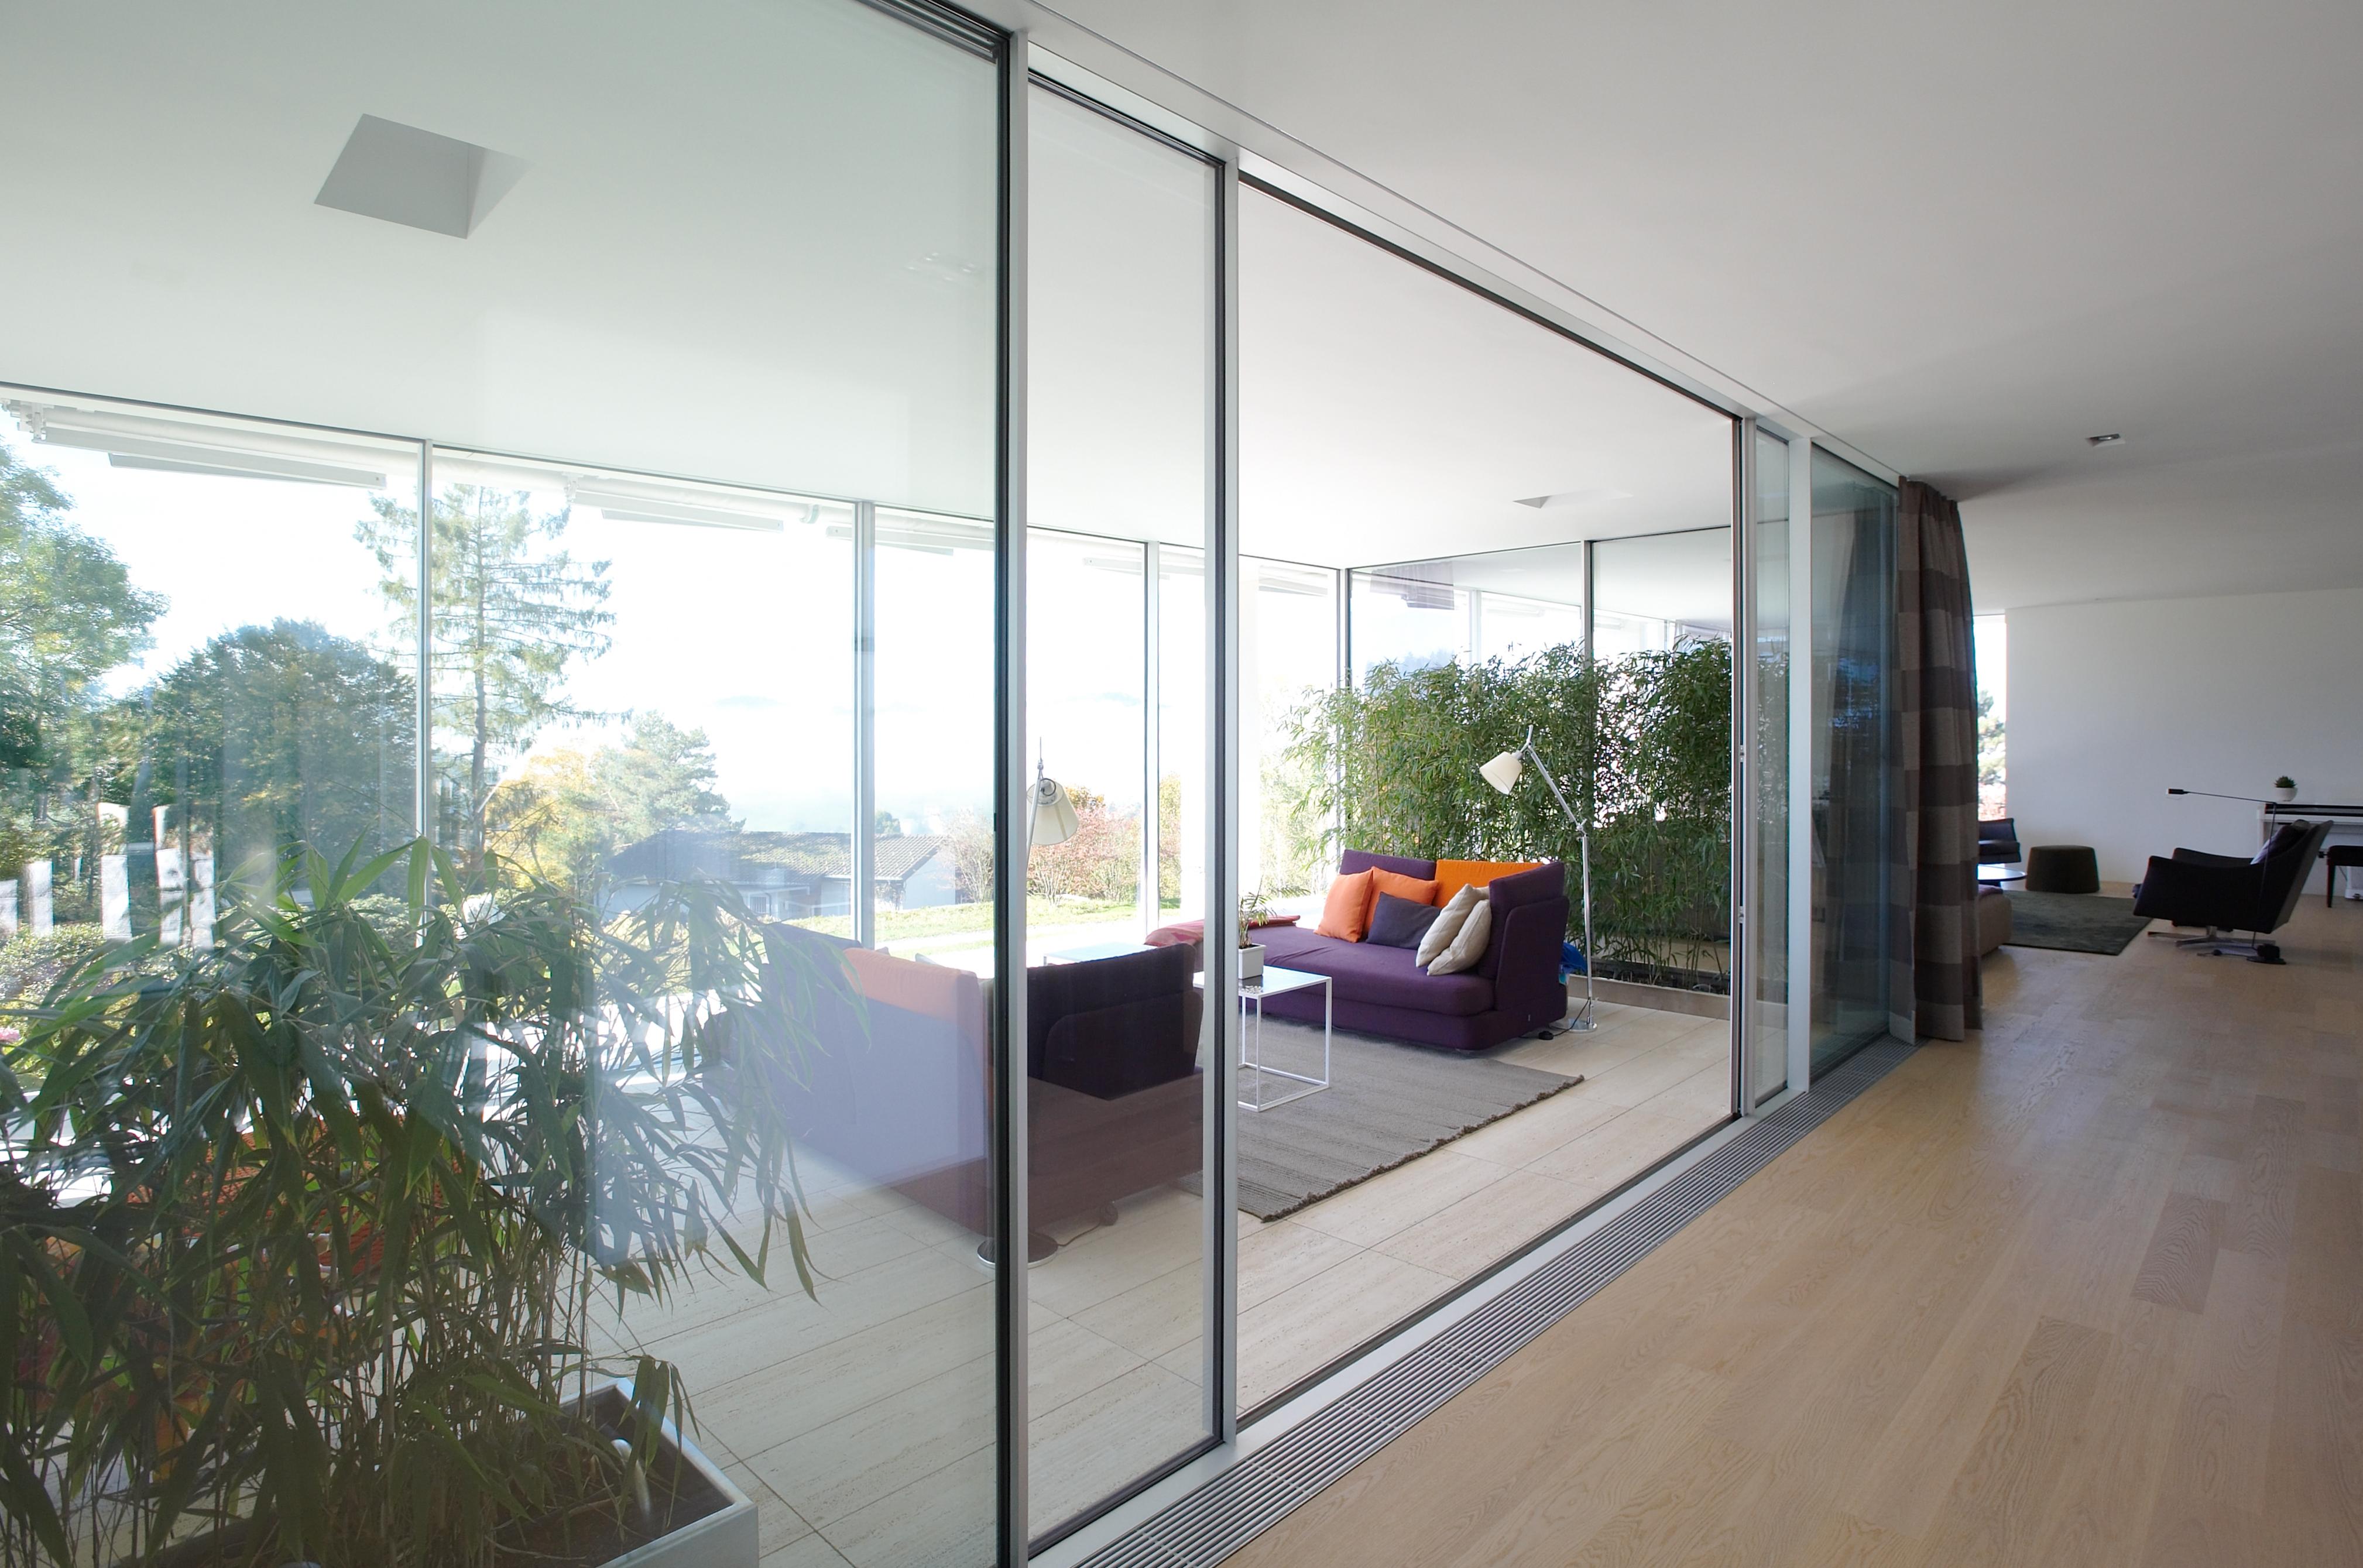 Einfamilienhaus Glasfassade sky frame 1 dover windows